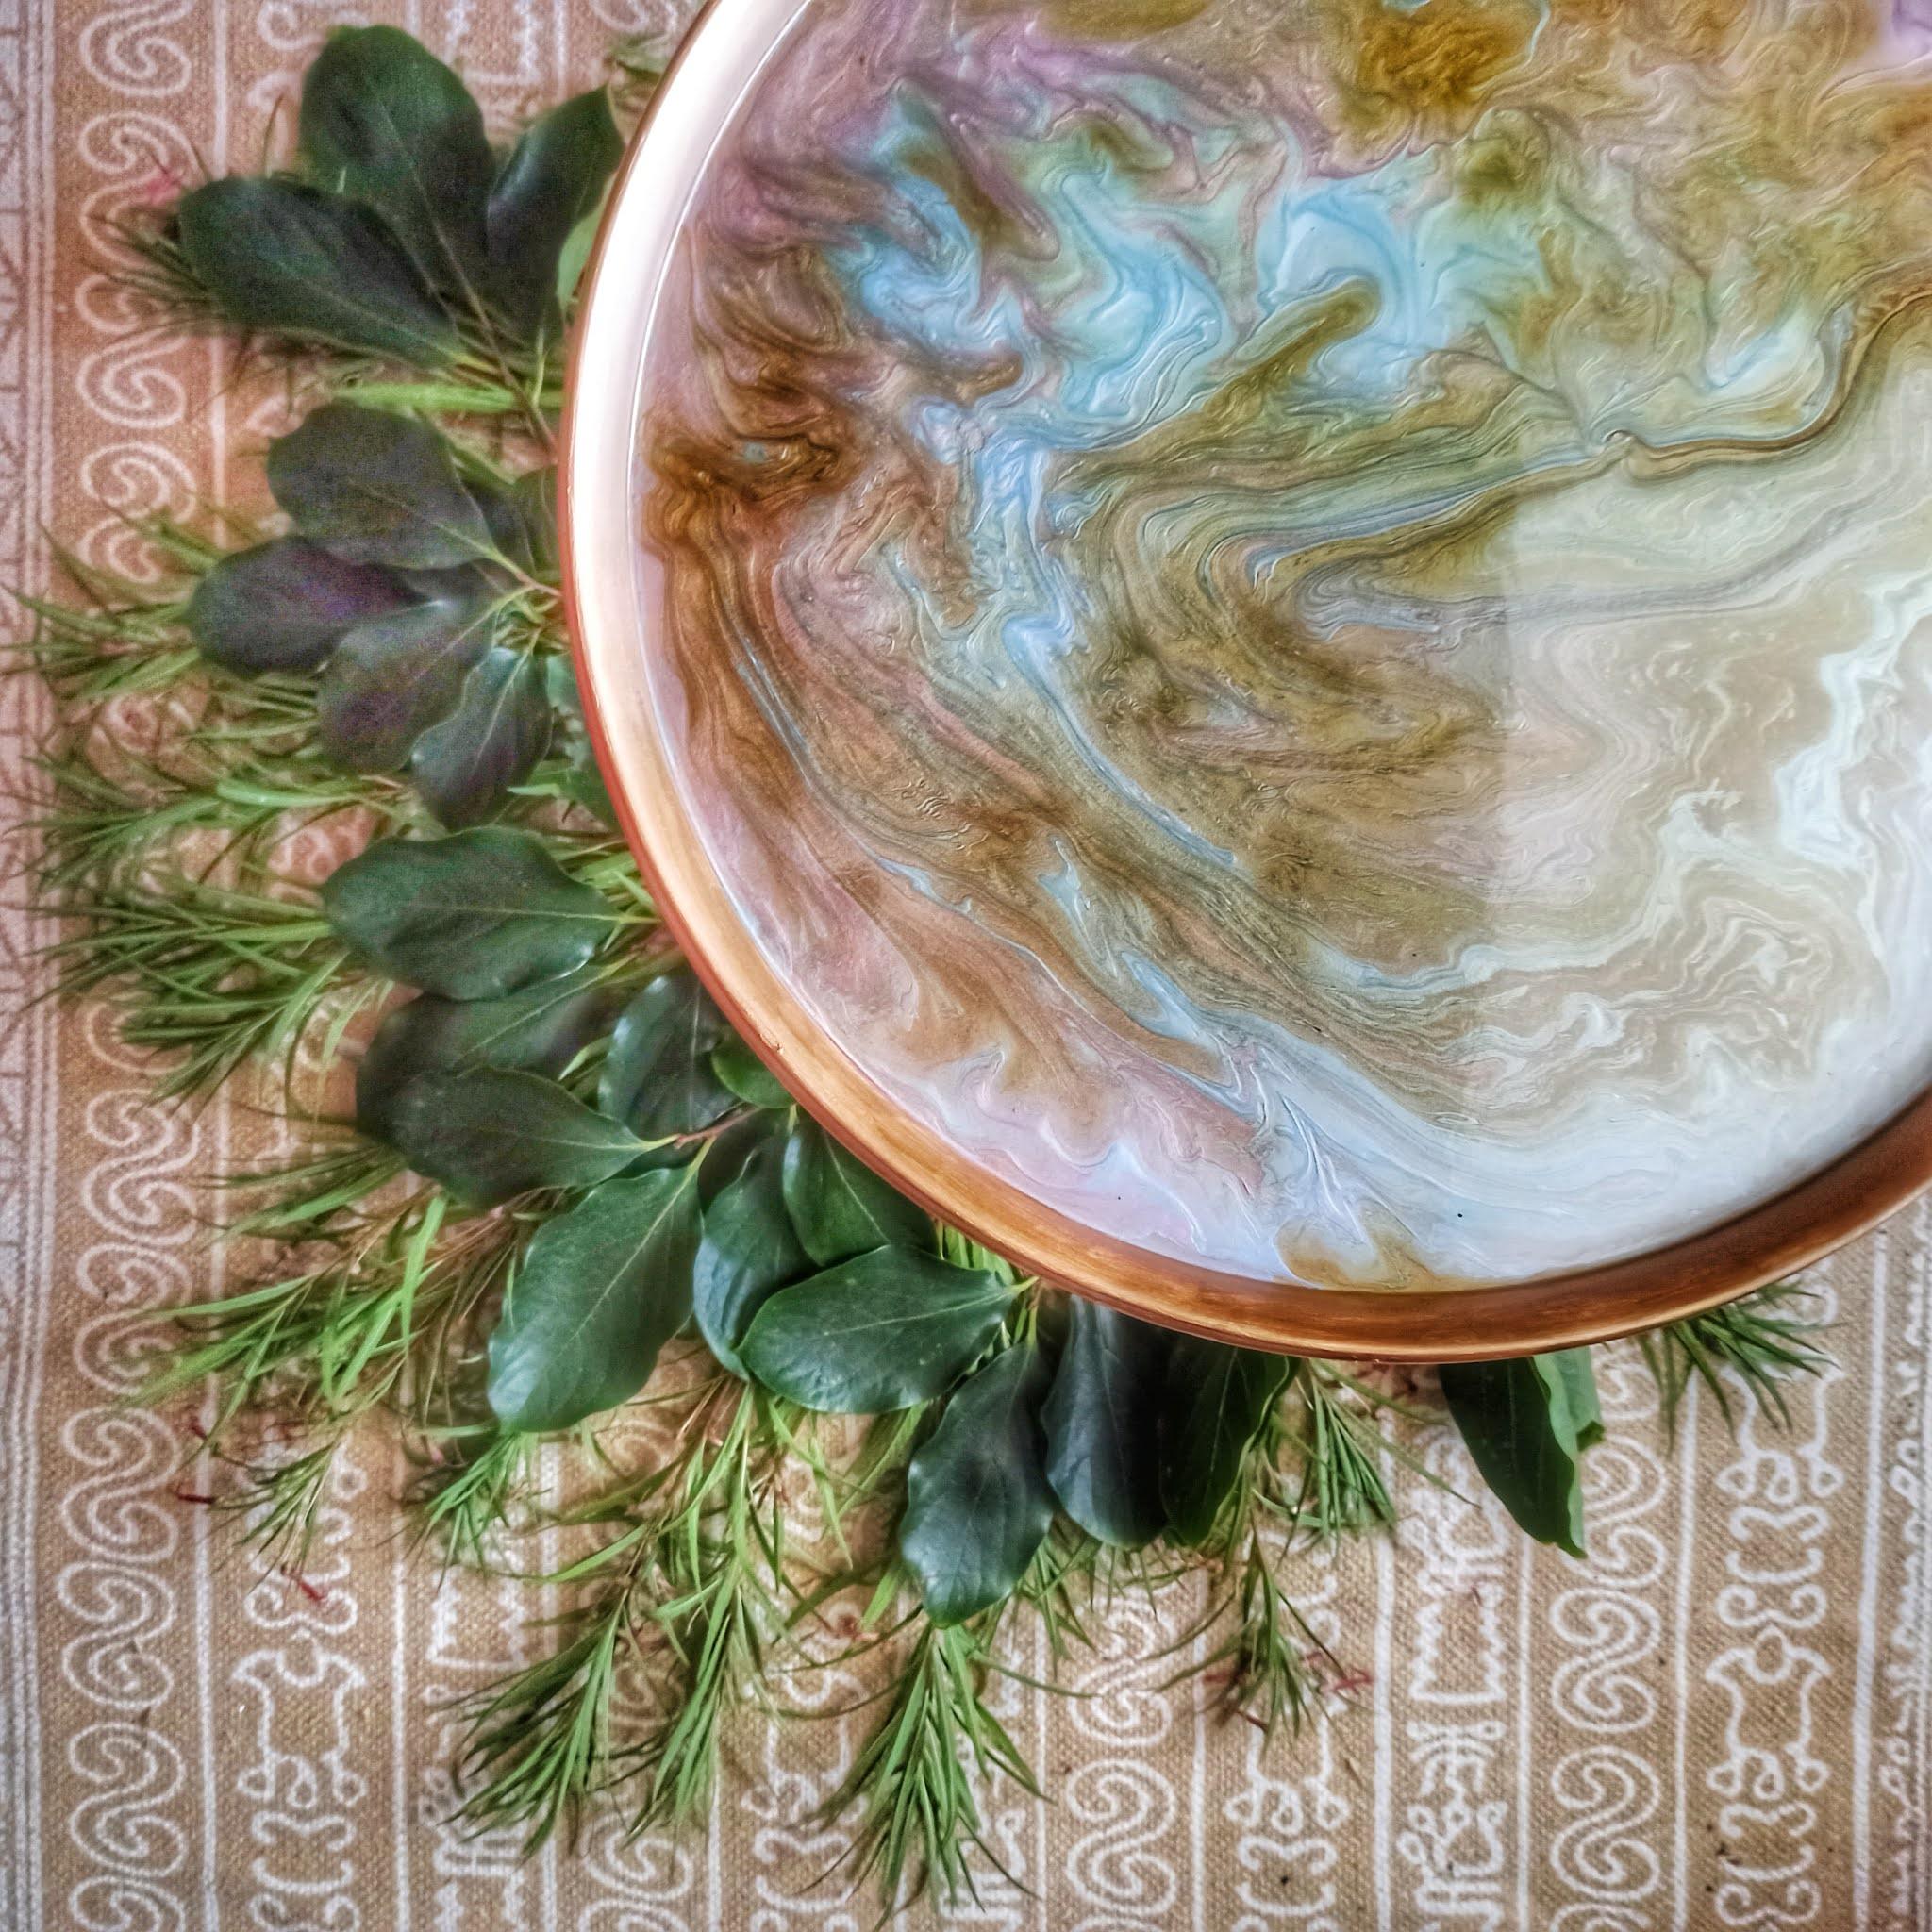 12-pouring-mesa-auxilia-despues